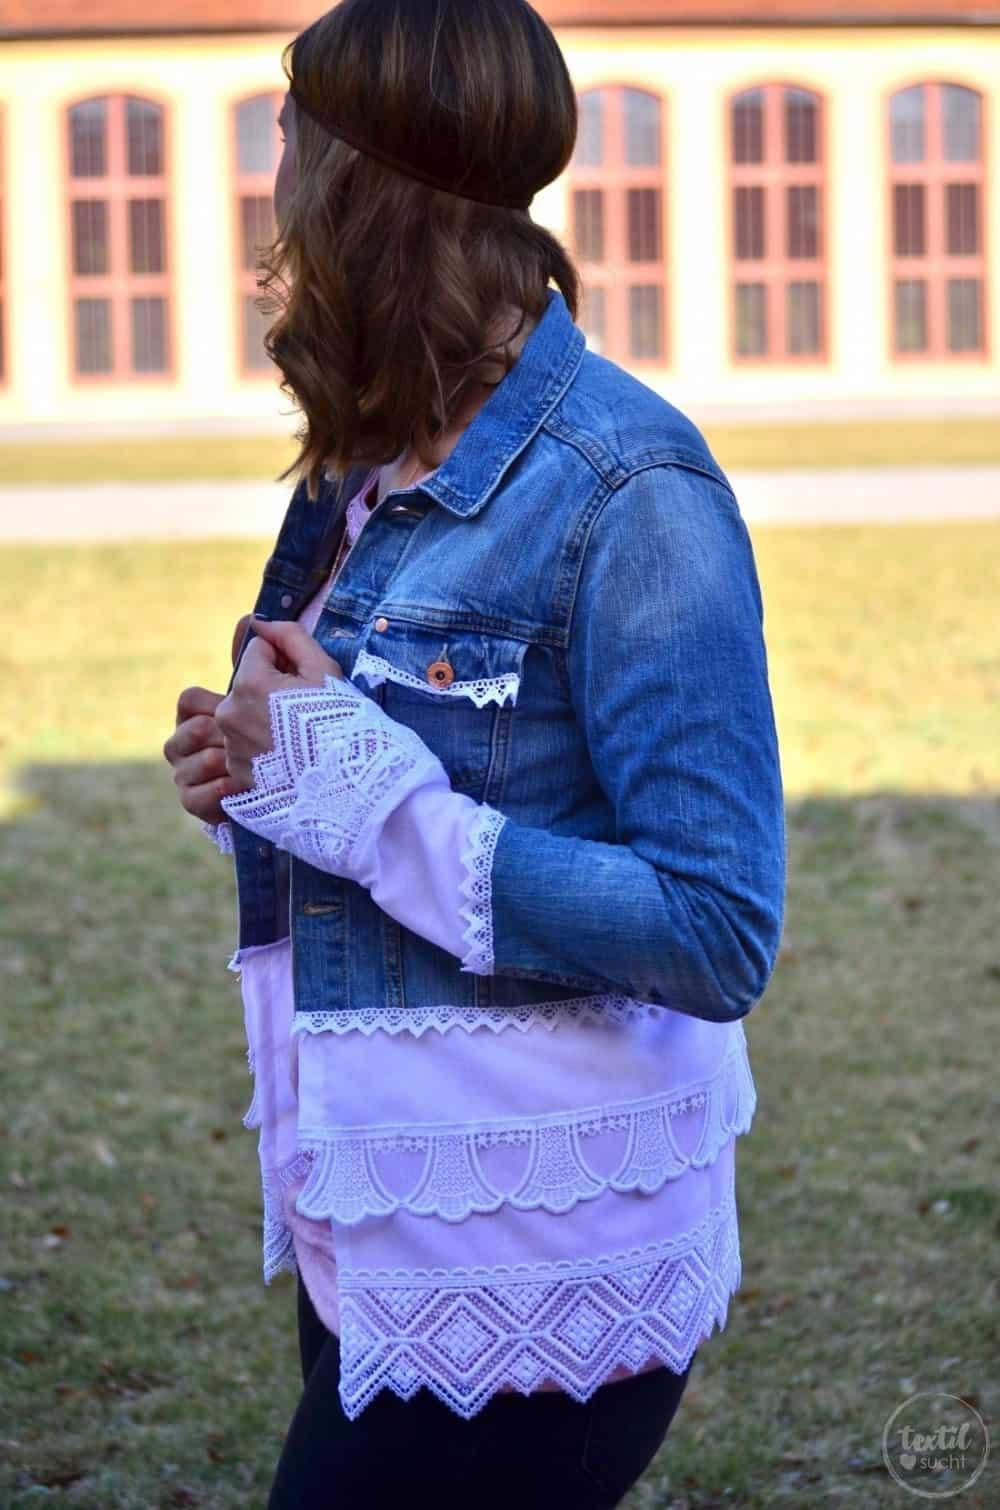 Tutorial: Jeansjacke Upcycling - Die fertige Jacke - Bild 4 | textilsucht.de